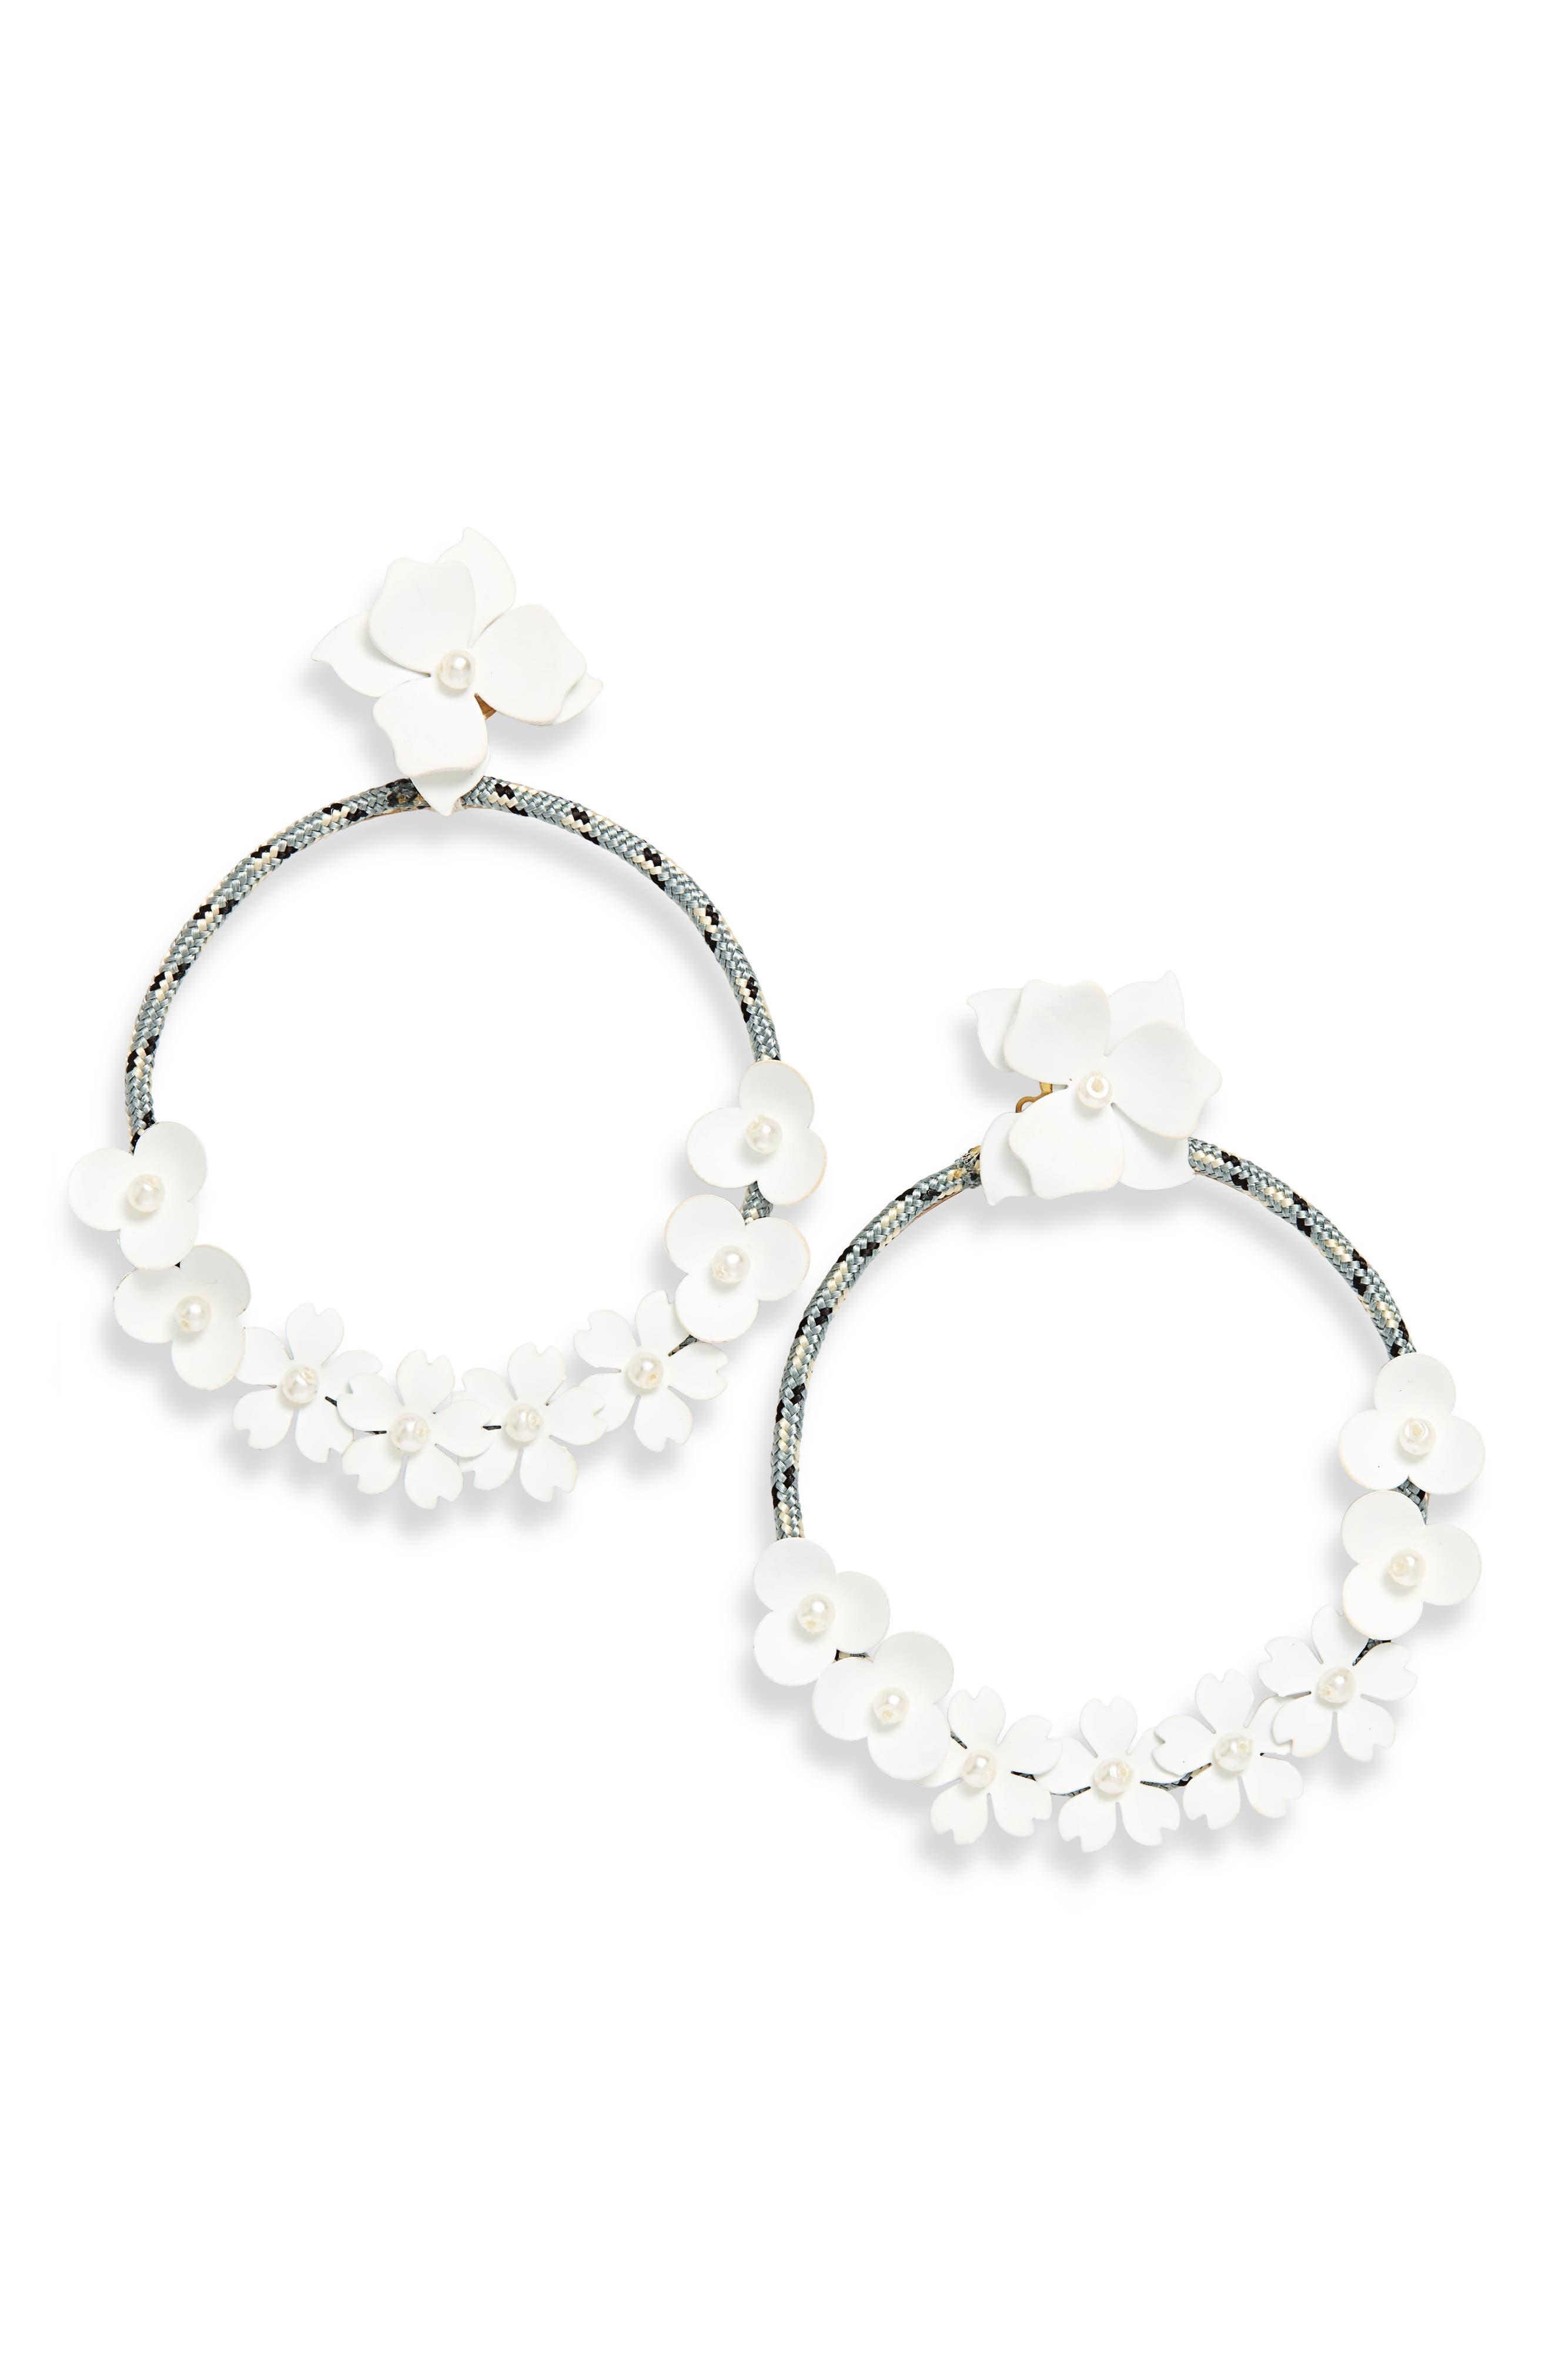 SEREFINA Flower Hoop Earrings in White